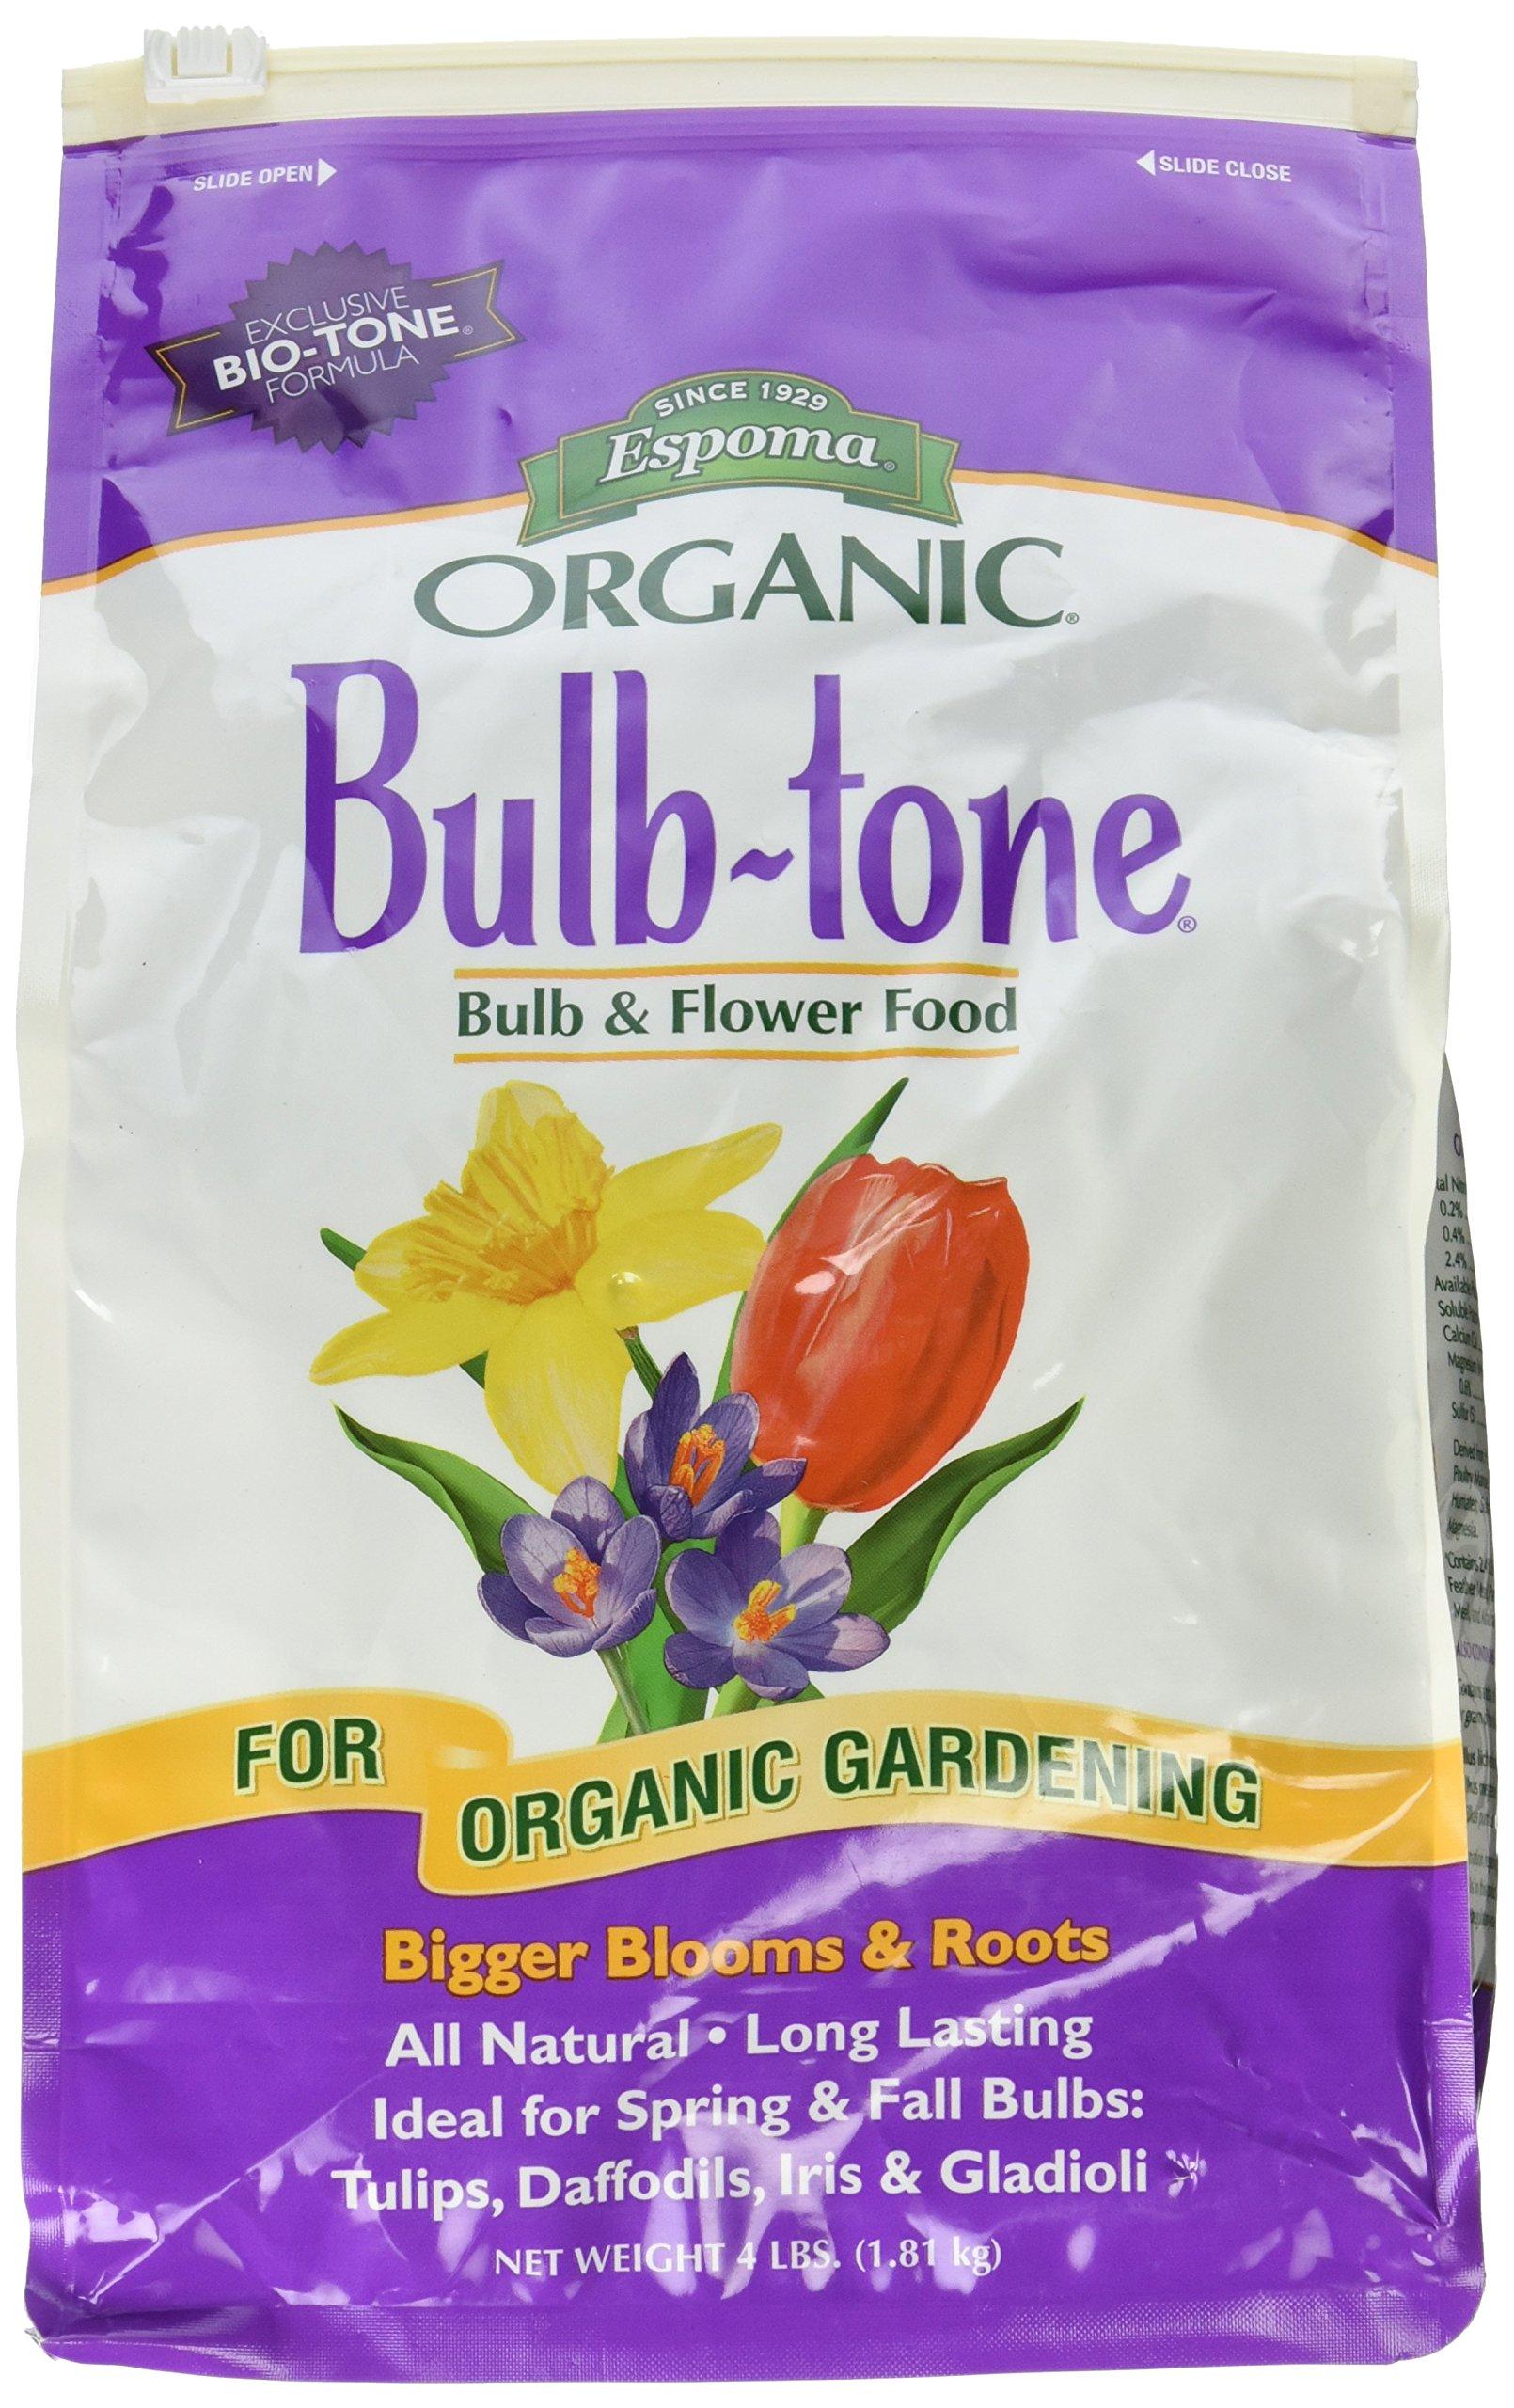 Espoma BT4 4-Pound Bulb-tone 3-5-3 Plant Food